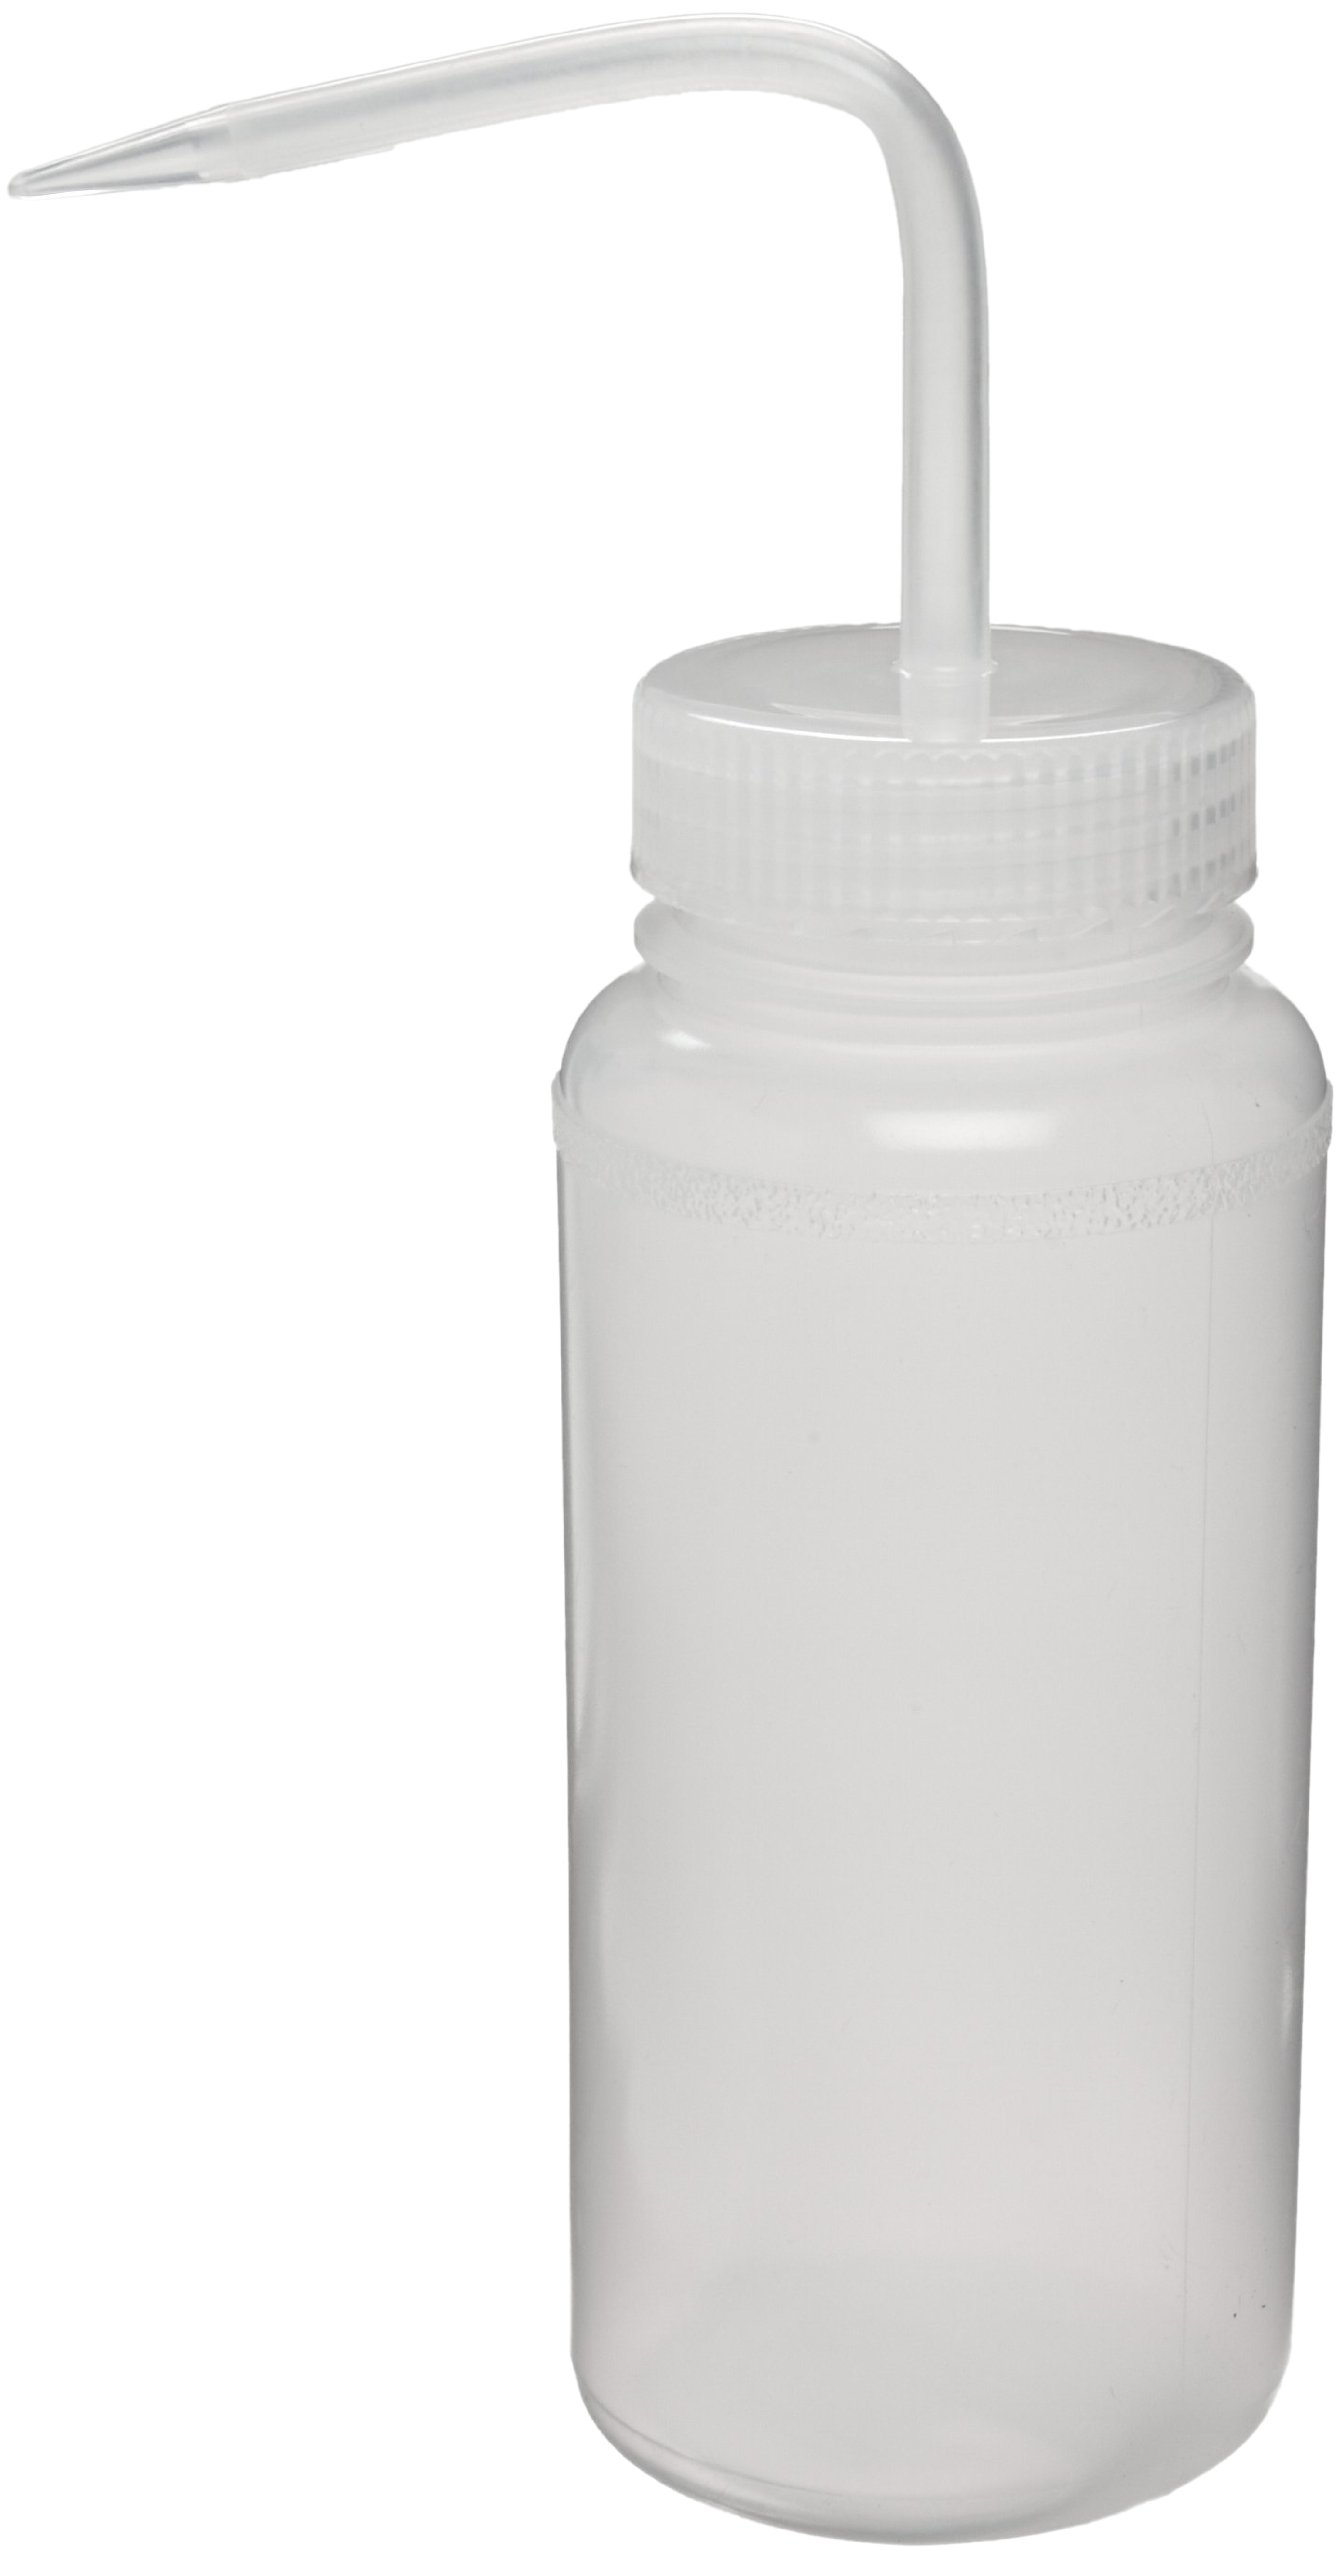 Bel-Art Wide-Mouth 500ml (16oz) Polyethylene Wash Bottles; Natural Polypropylene Cap, 53mm Closure (Pack of 6) (F11620-0500) by SP Scienceware